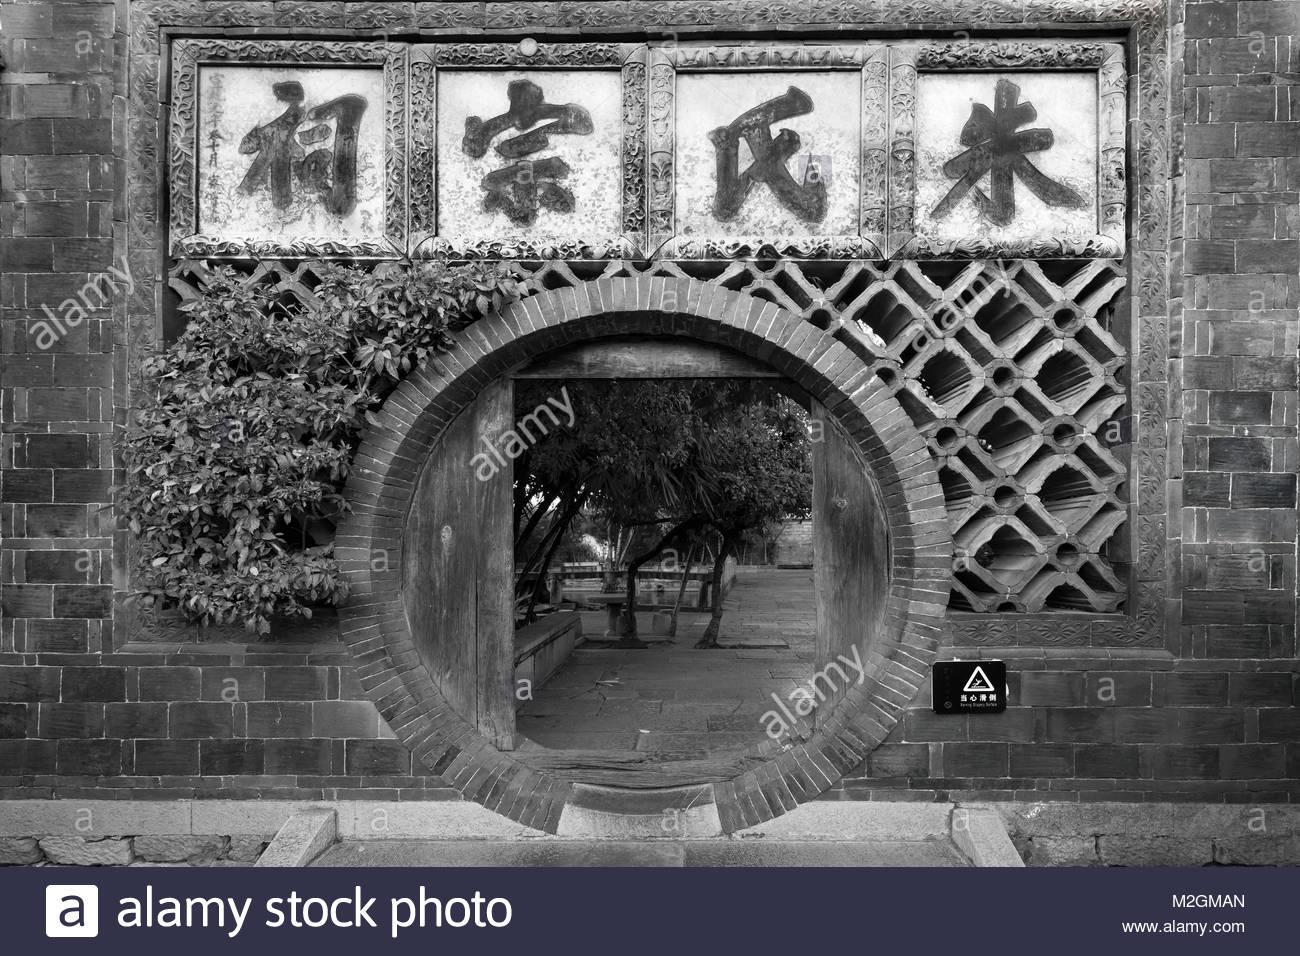 Decorating circular door images : Circular Door Stock Photos & Circular Door Stock Images - Alamy